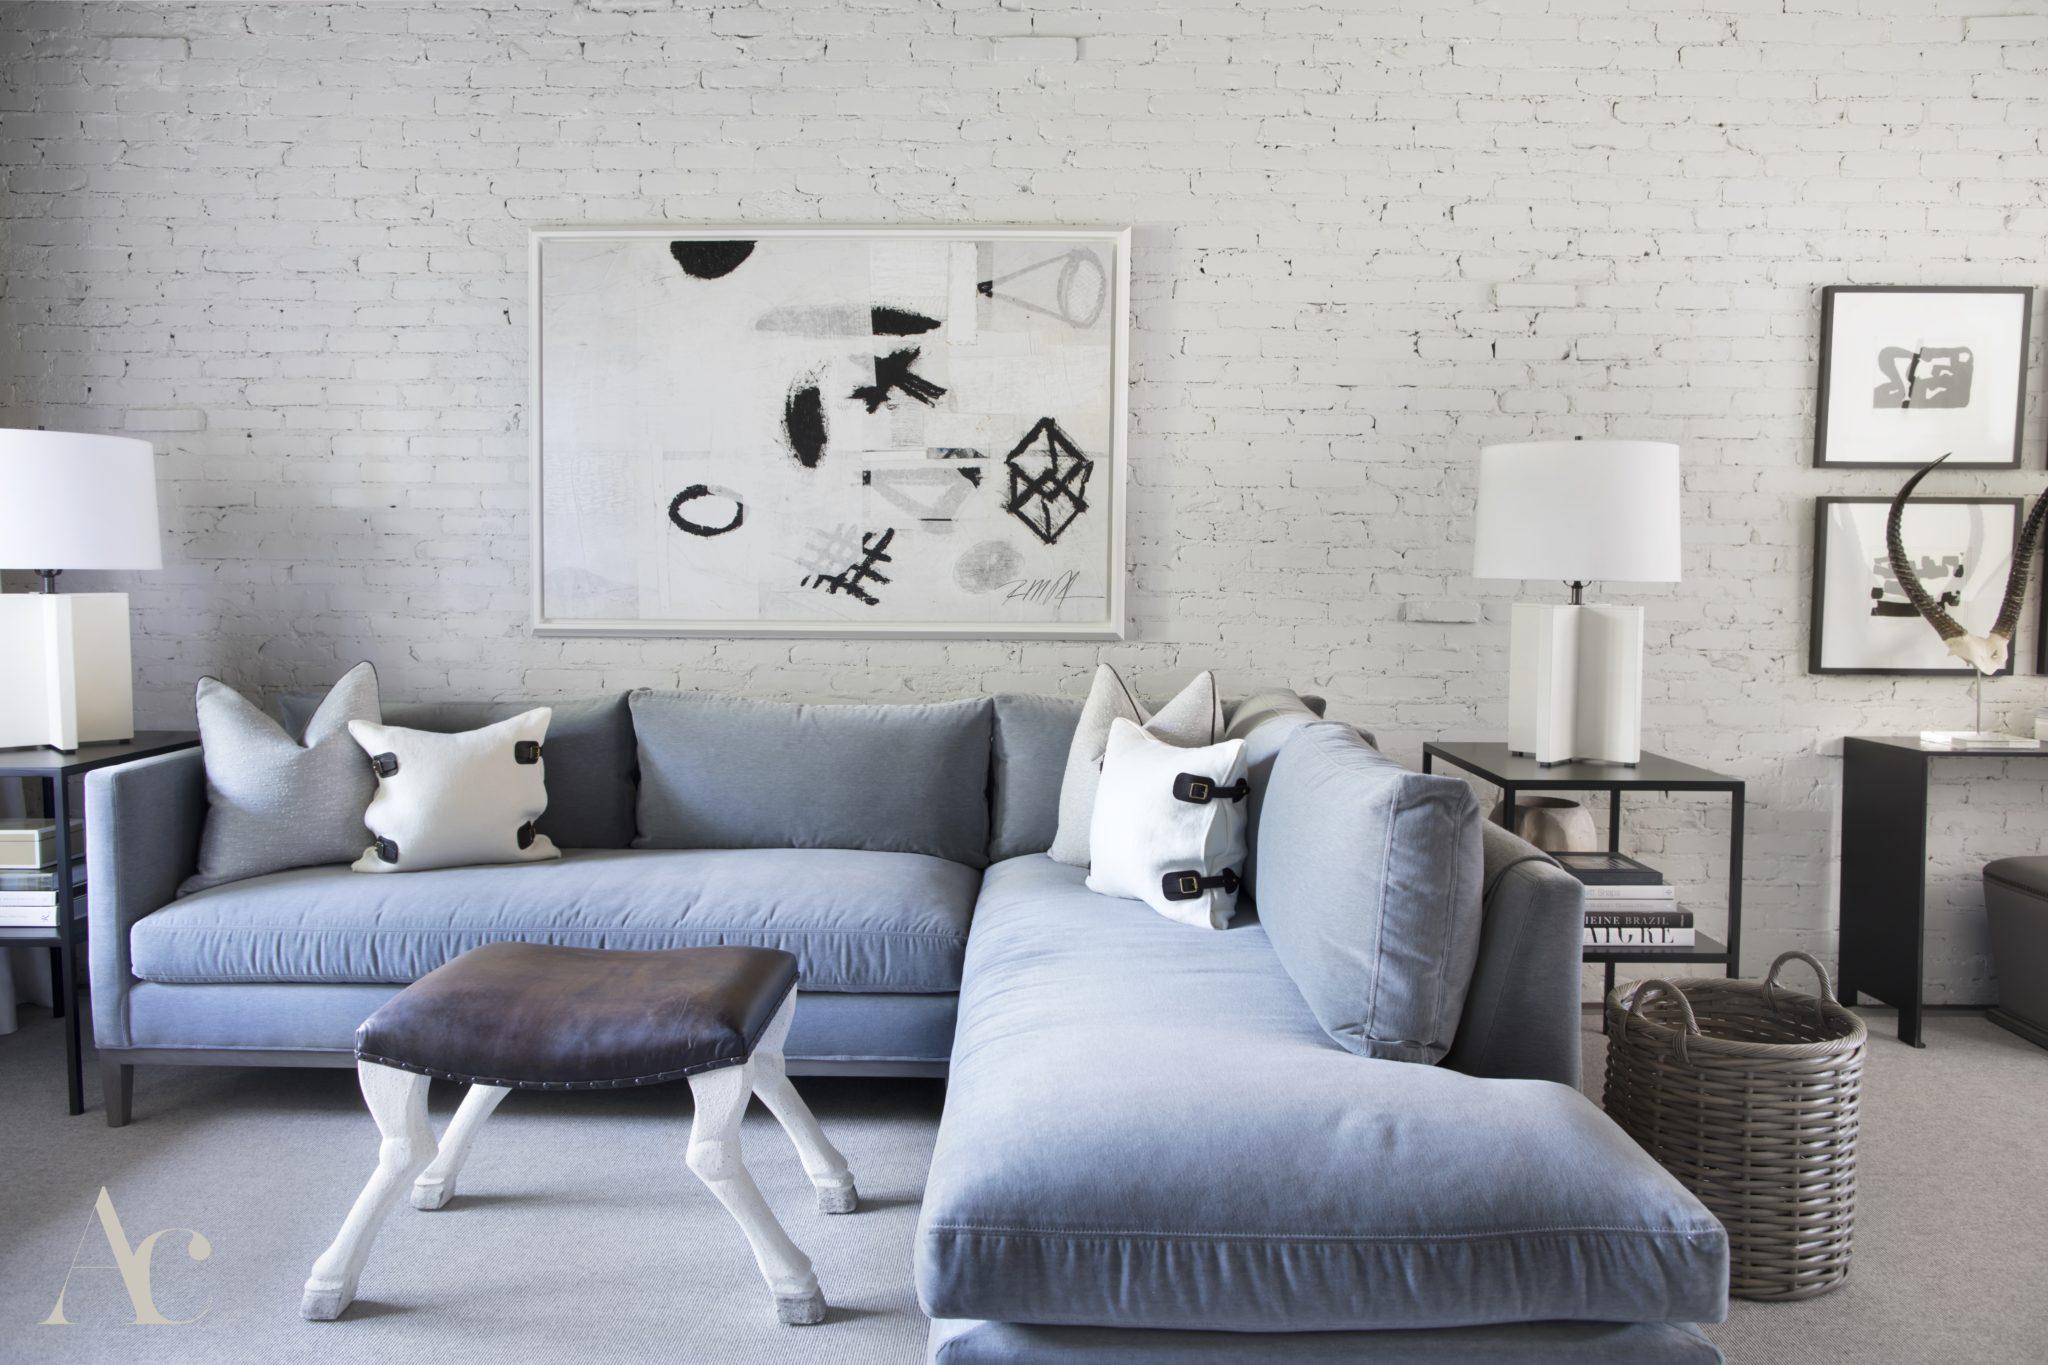 Row house remodel in Birmingham, Alabama, by Amanda Cooper Interiors